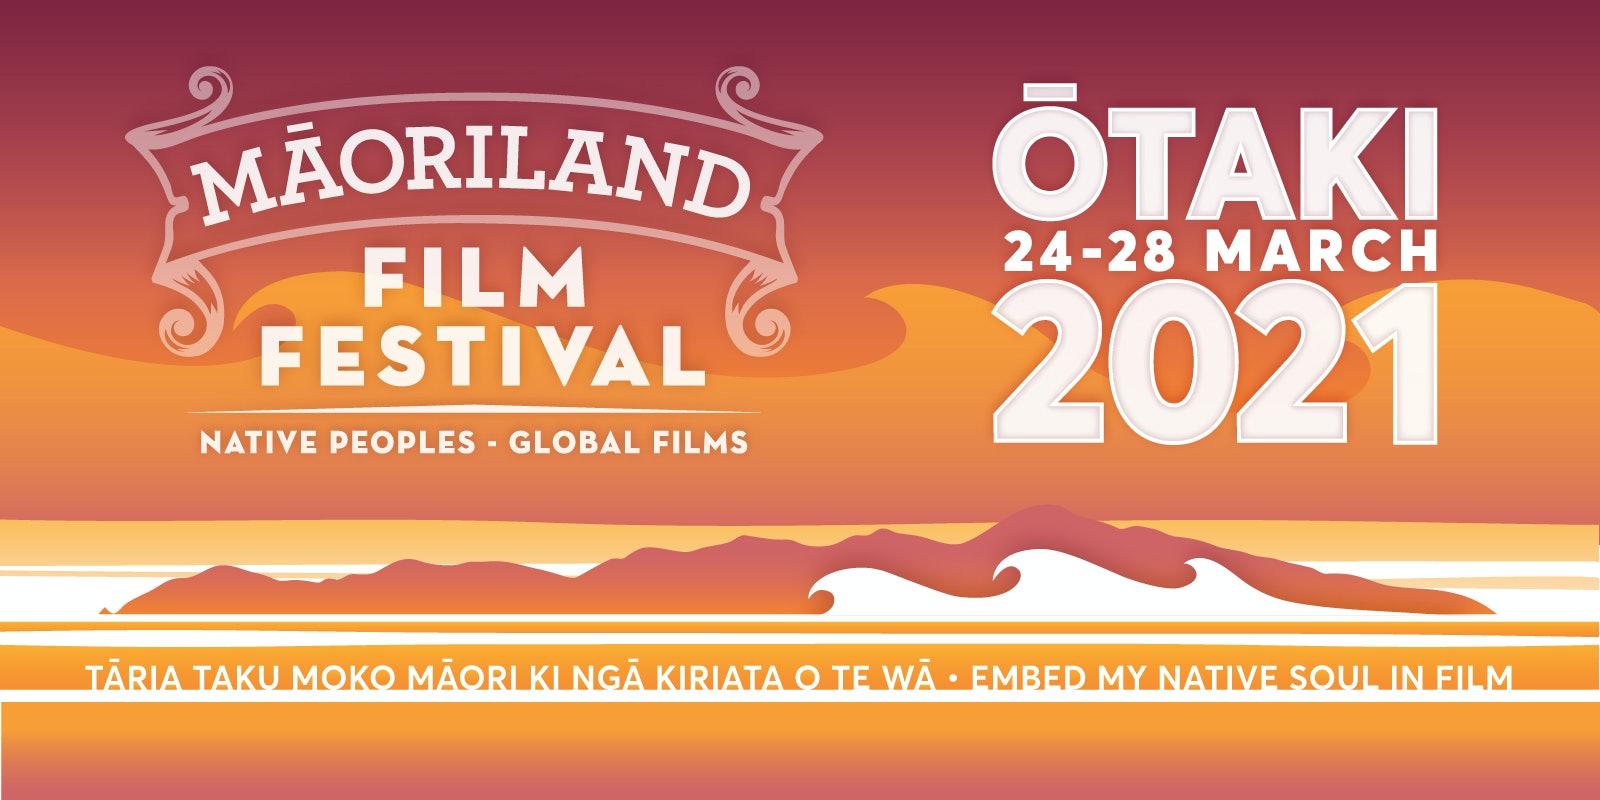 MAORILAND FILM FESTIVAL 2021 Tikiti ta Koha